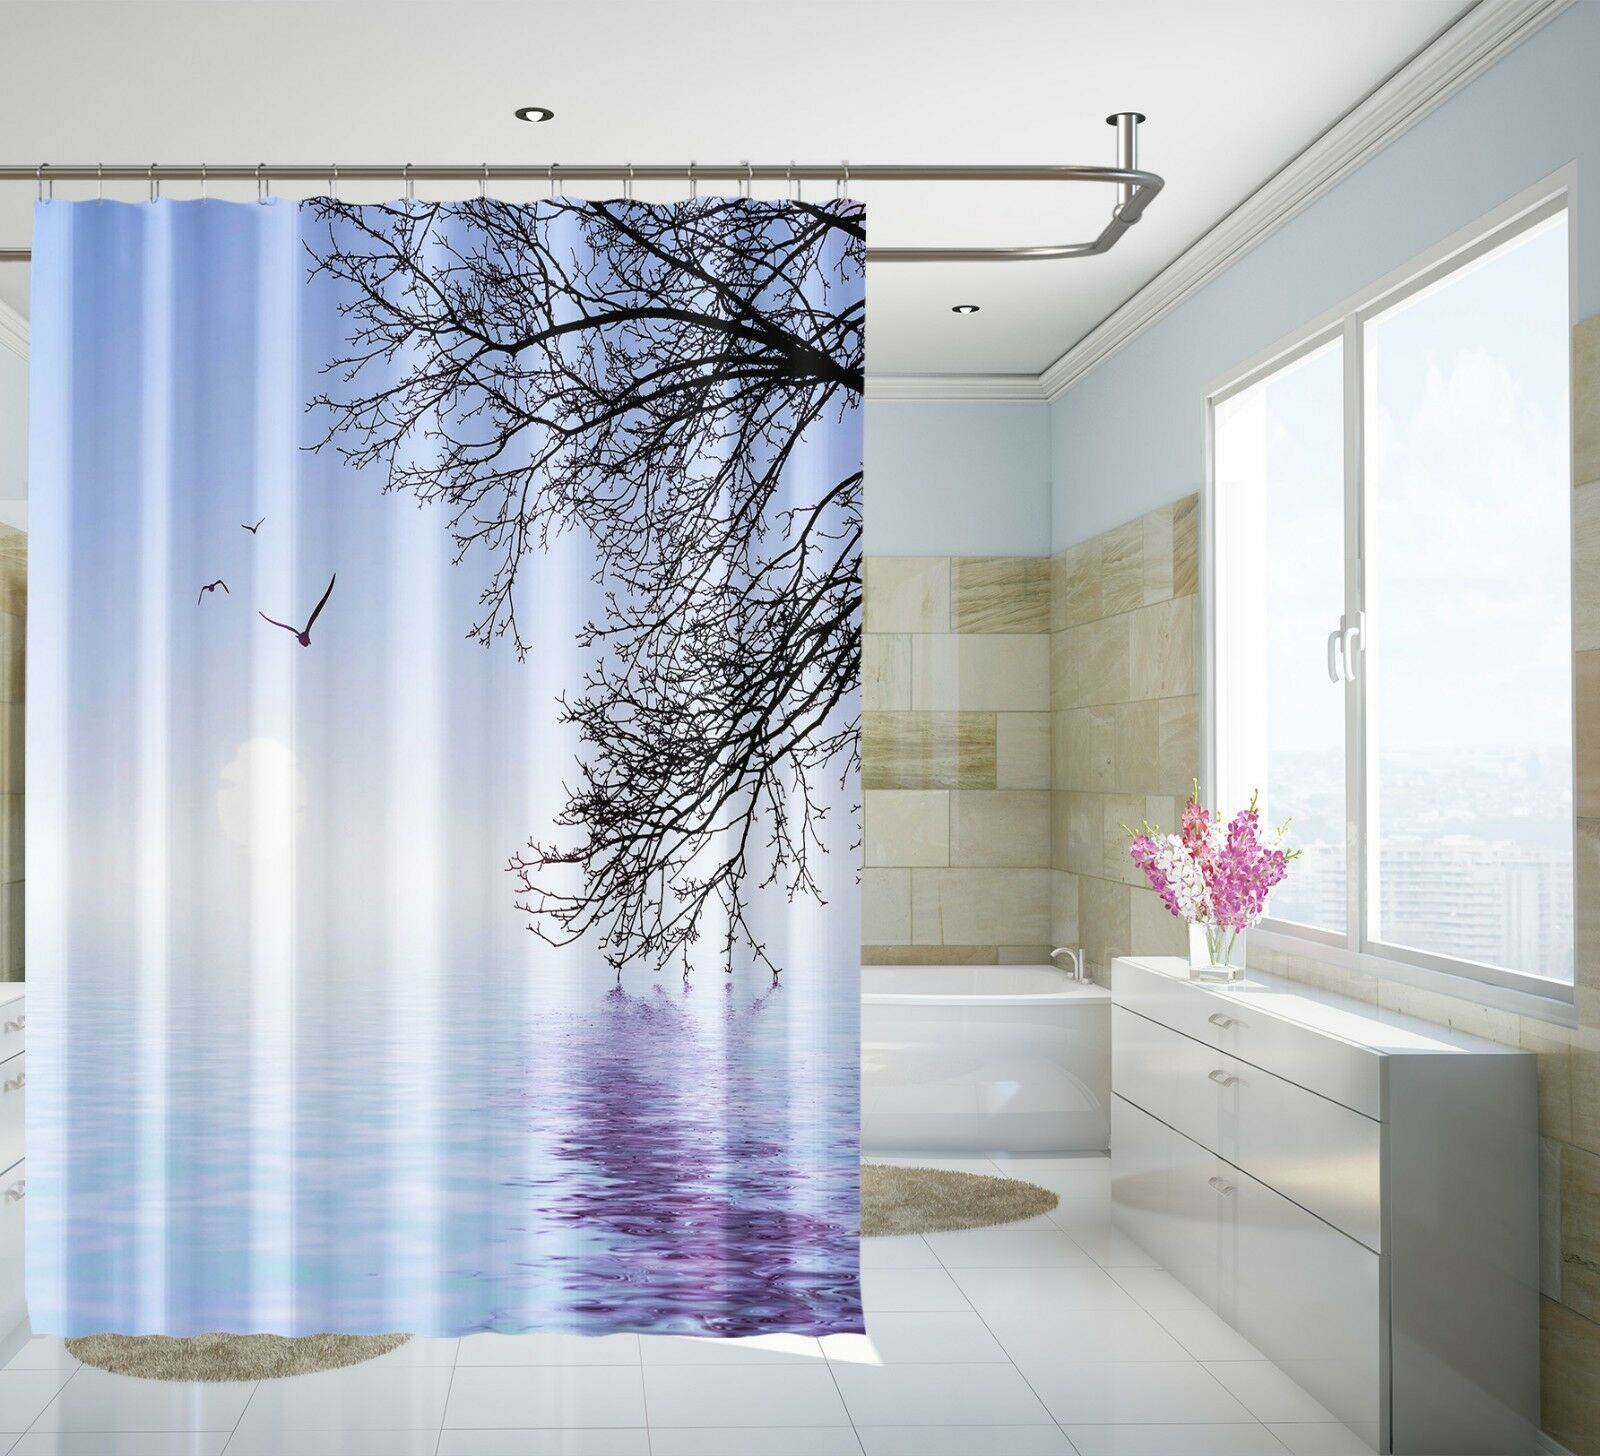 3d Nette Giraffe 9 Duschvorhang Wasserdicht Faser Bad Daheim Window Toilette De Window Treatments & Hardware Shower Curtains